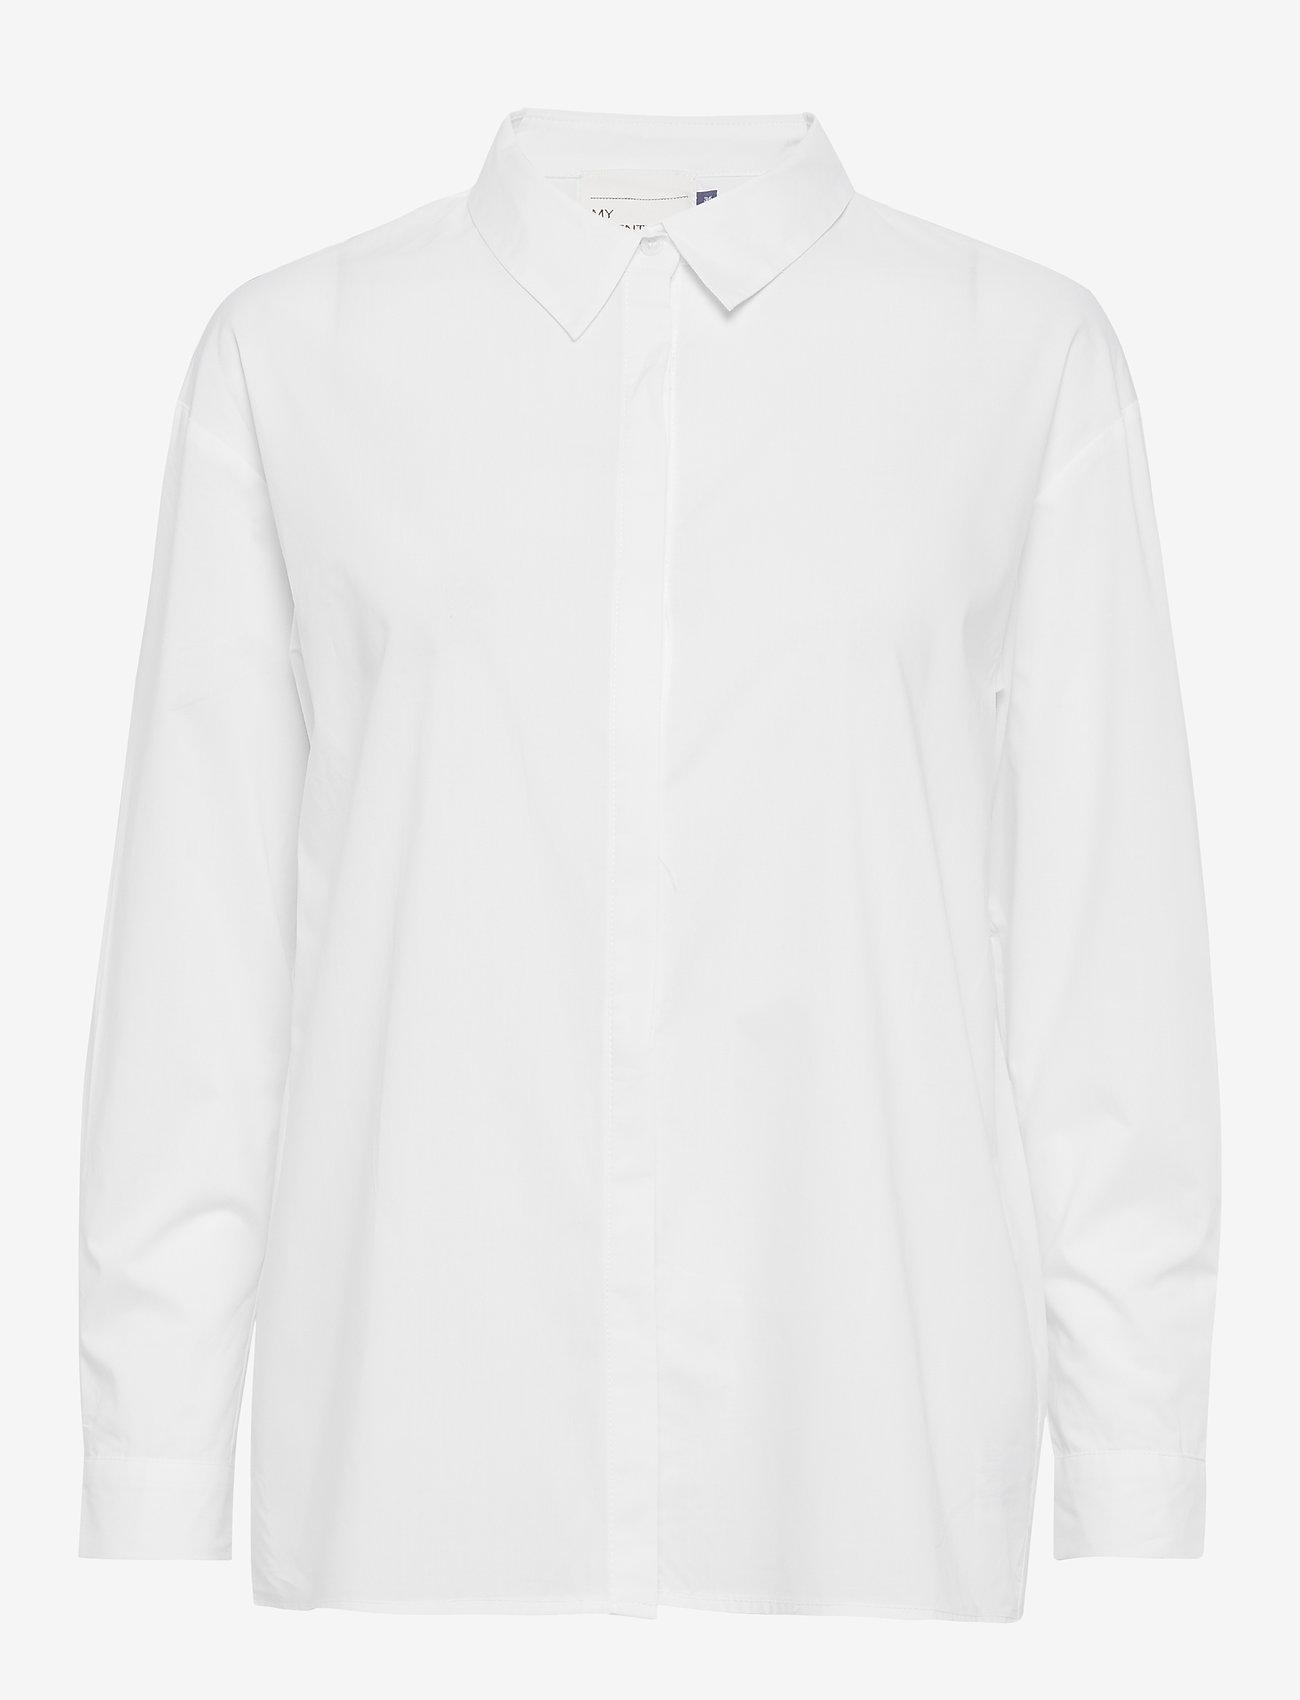 Denim Hunter - 03 THE SHIRT - långärmade skjortor - optical white - 1